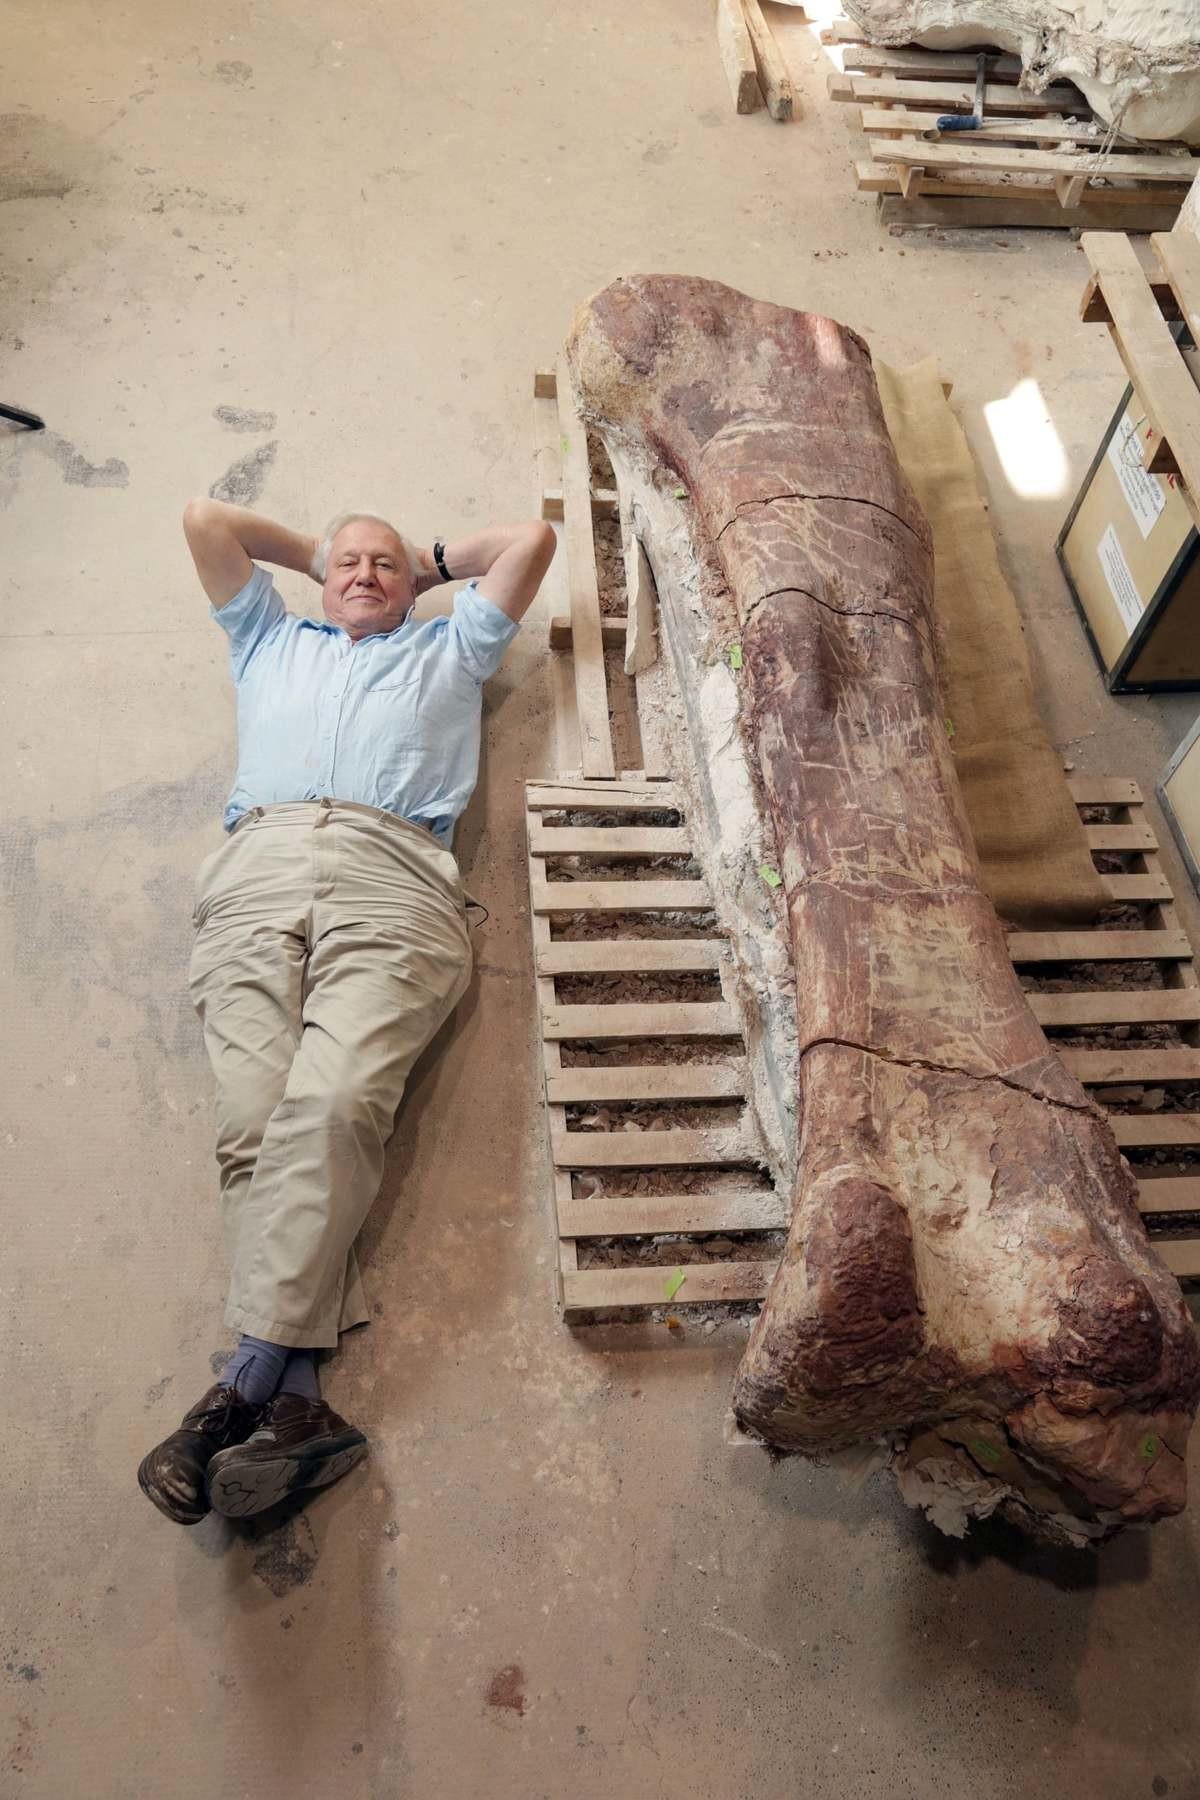 Titanosaur Vs David Attenborough. Sir David Attenborough and a Titanosaur bone. Titanosaurs (members of the group Titanosauria) were a diverse group of sauropod